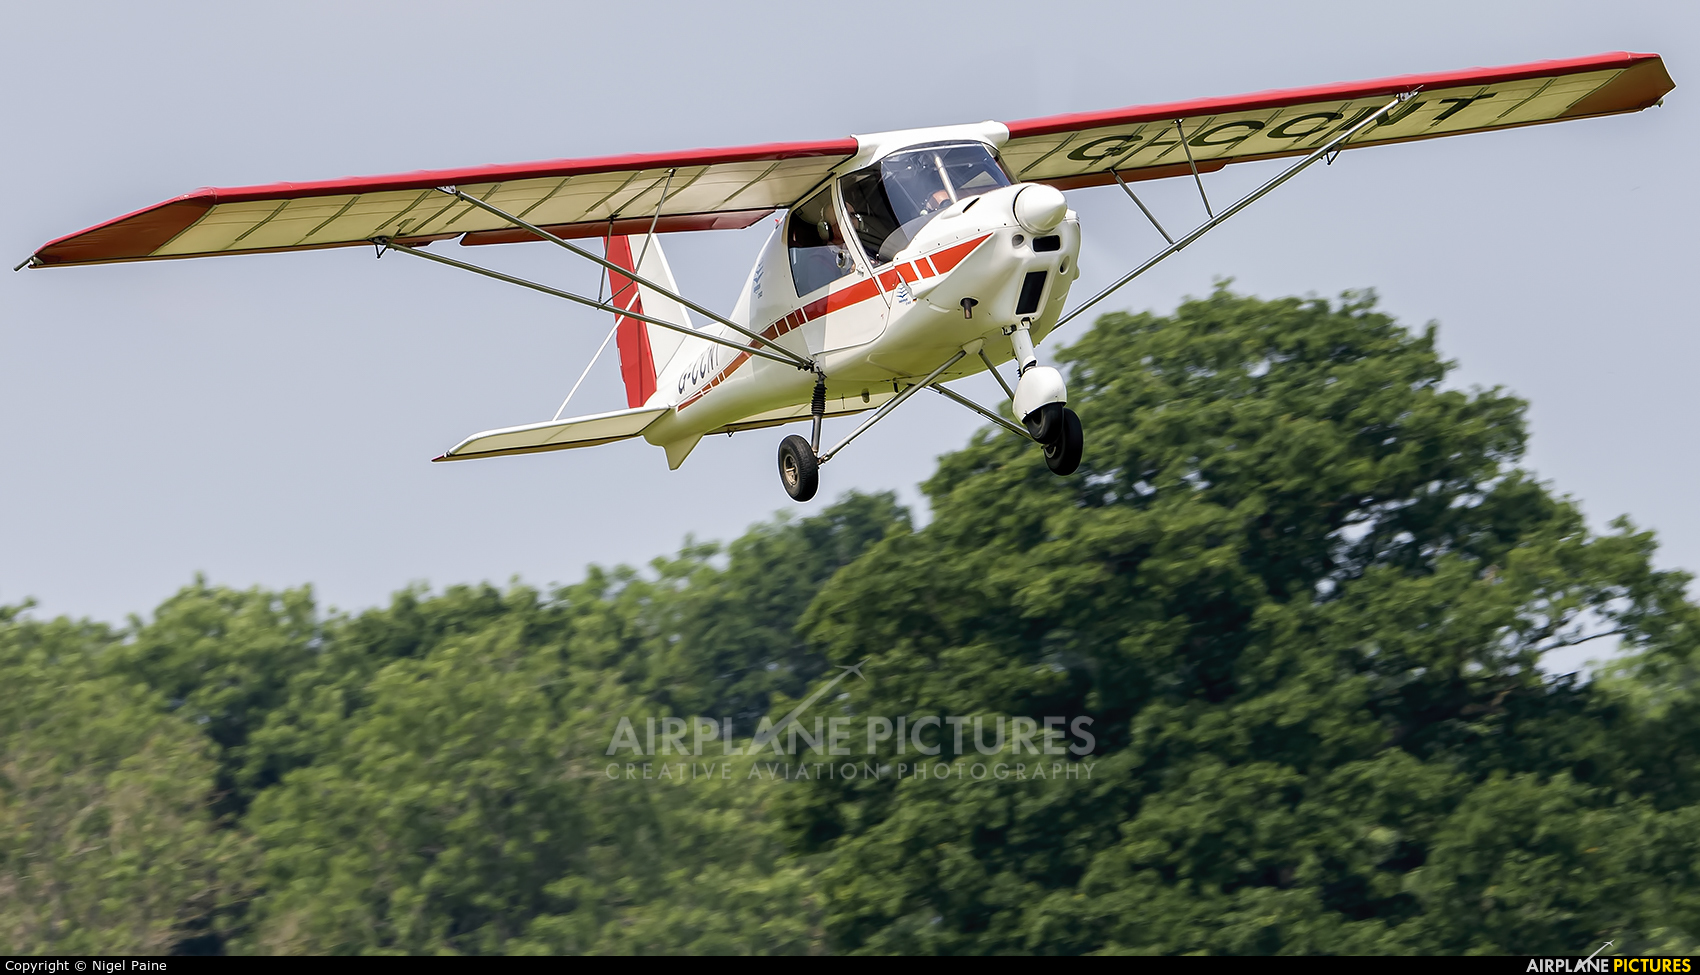 Private G-CCNT aircraft at Lashenden / Headcorn